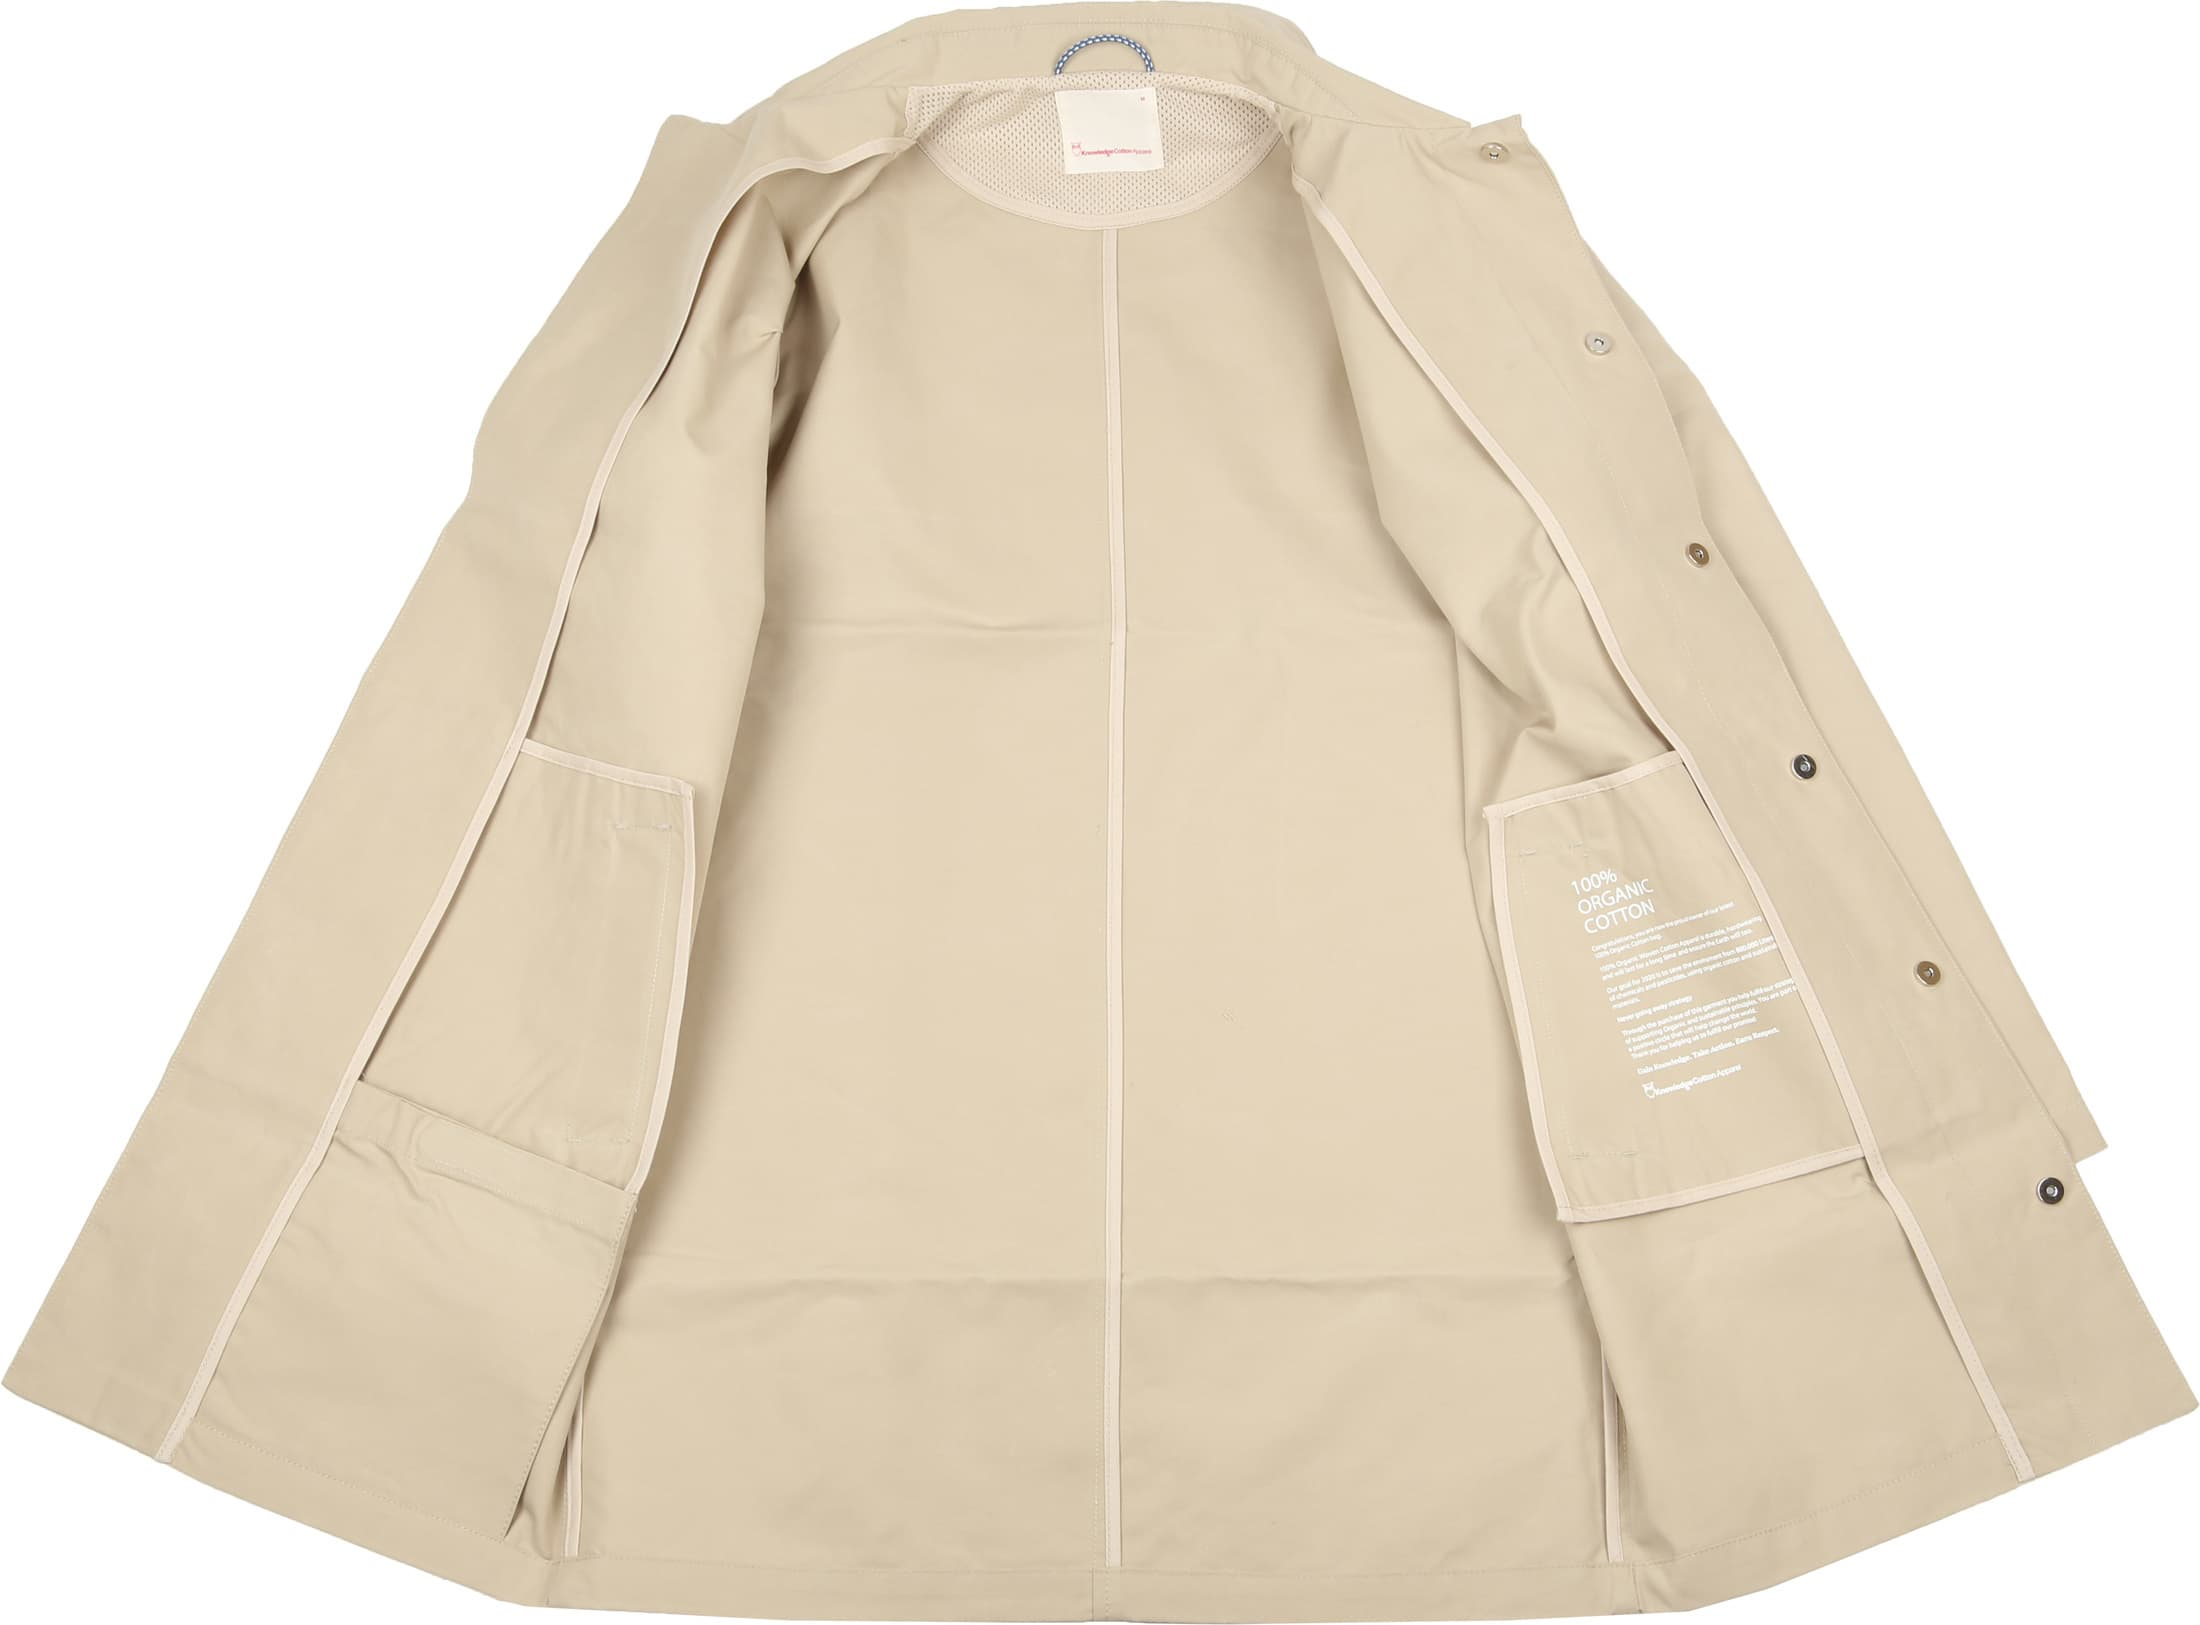 KnowledgeCotton Apparel Carcoat Beige